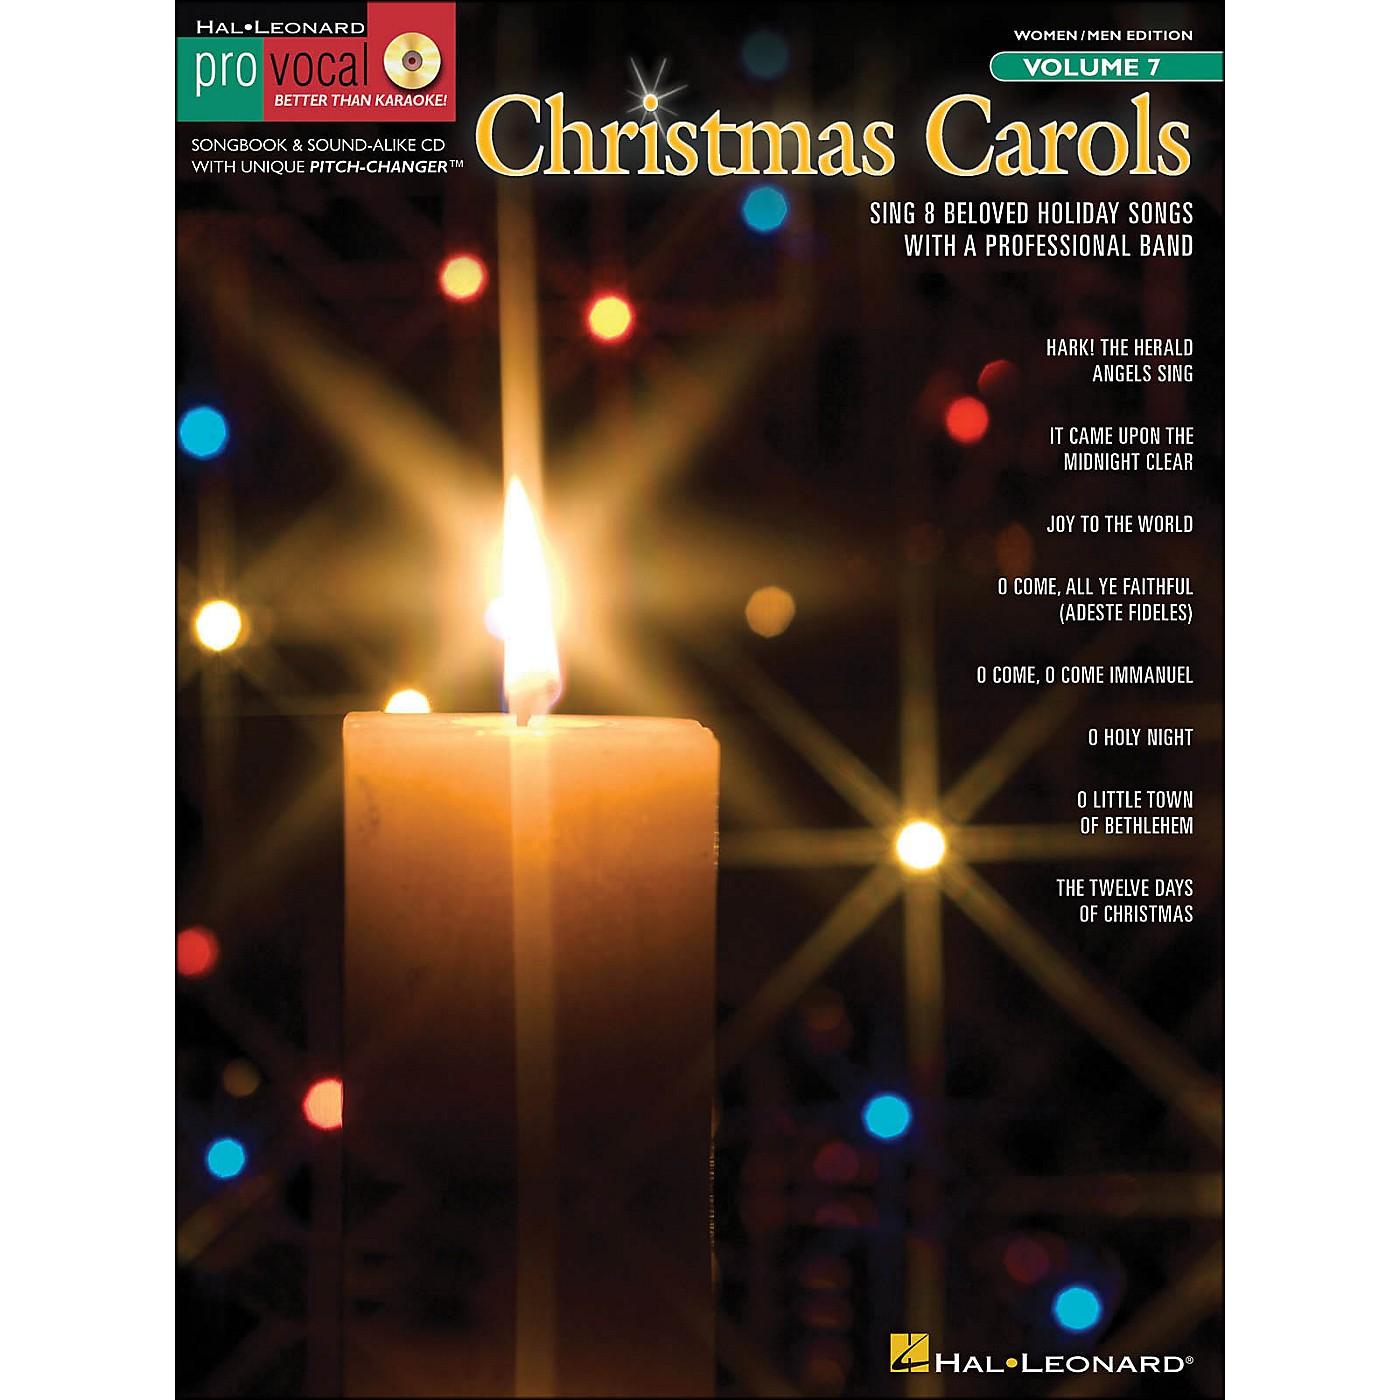 Hal Leonard Christmas Carols Pro Vocal Songbook for Women/Men Volume 7 Book/CD thumbnail